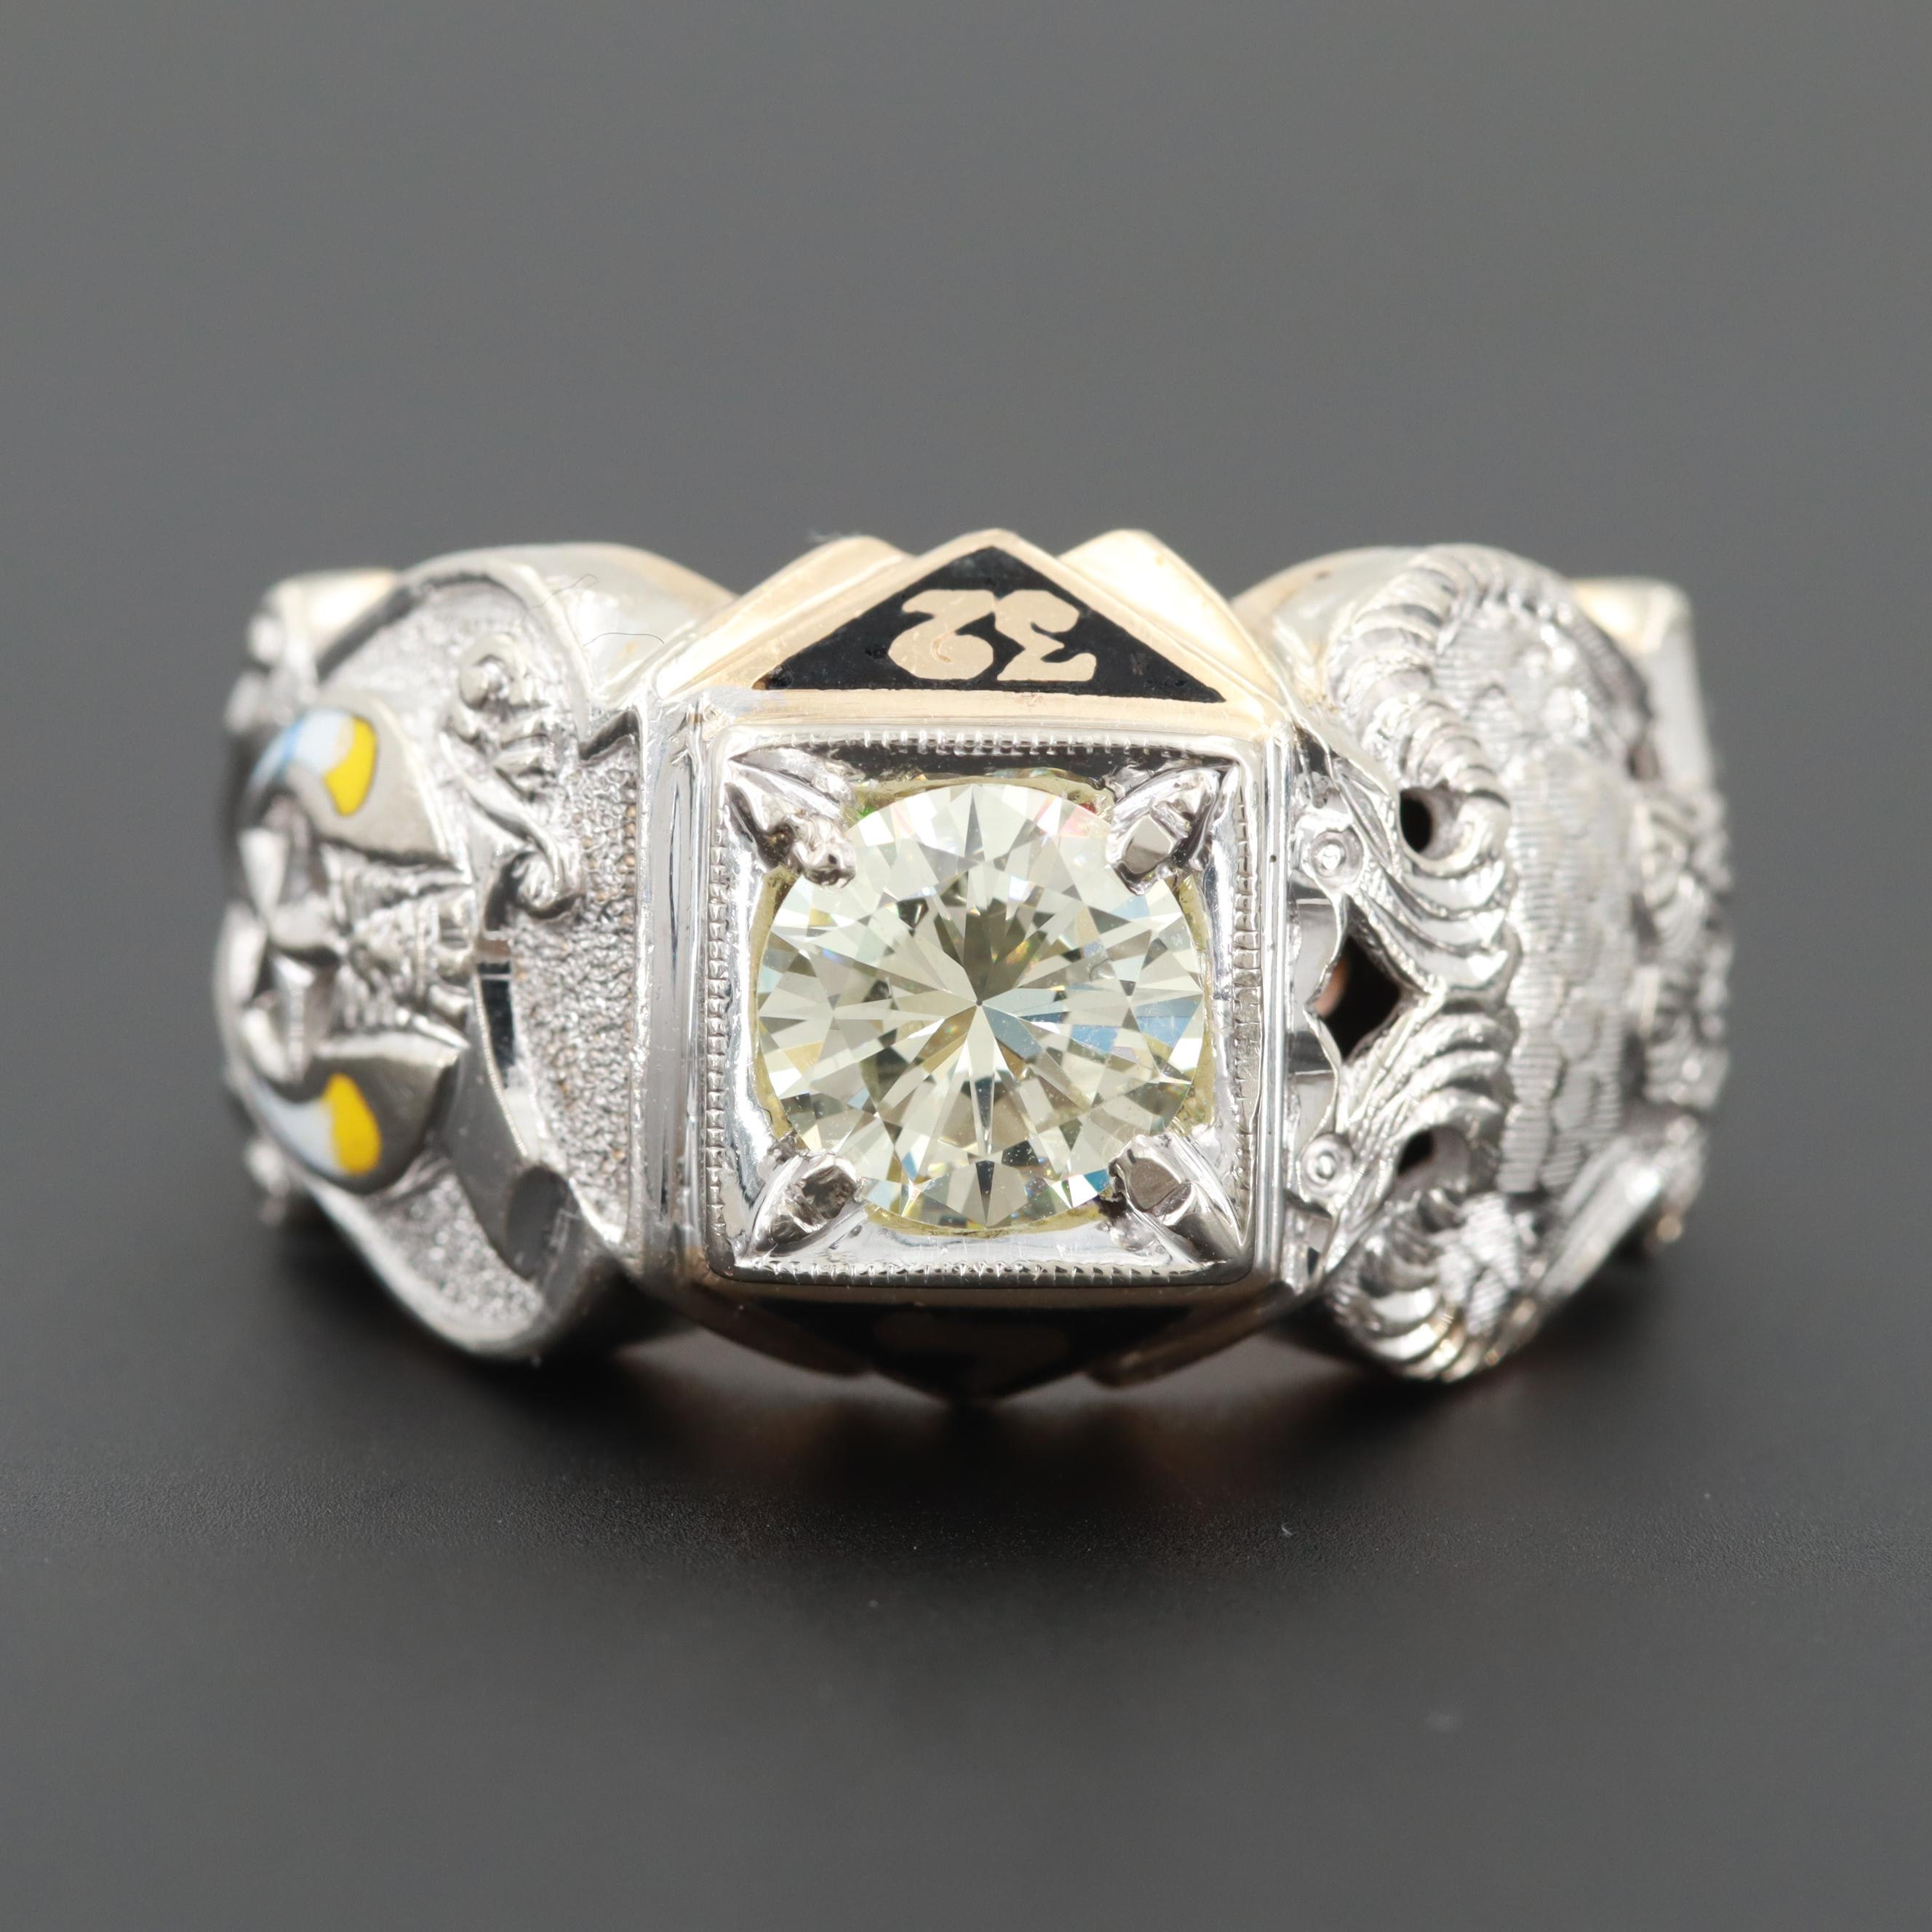 14K White and Yellow Gold 1.32 CT Diamond and Enamel 32nd Degree Masonic Ring